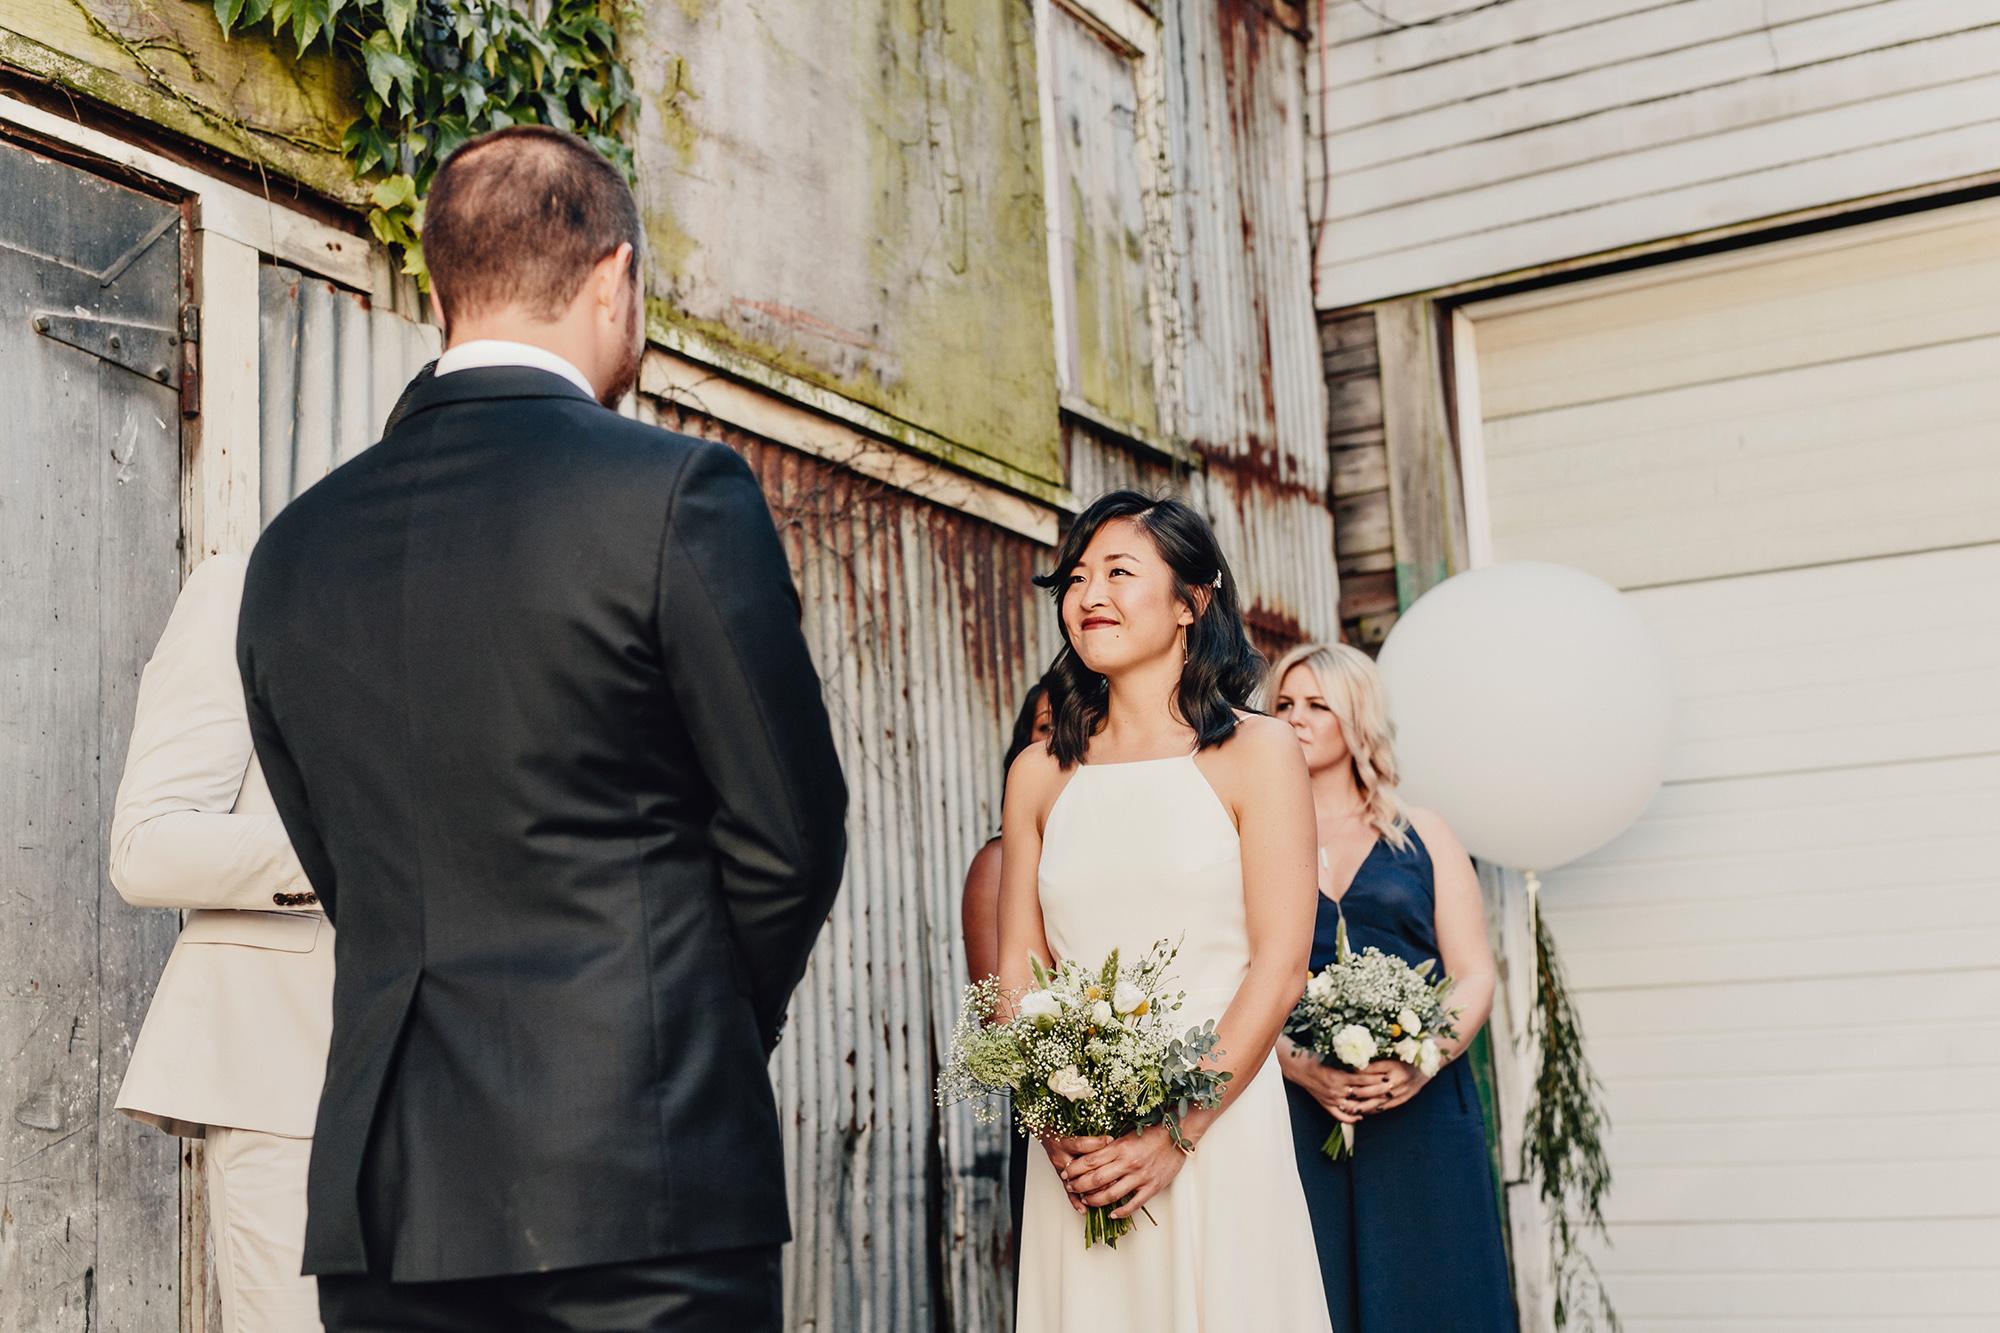 Bonaccord-Vancouver-Wedding-0036.JPG